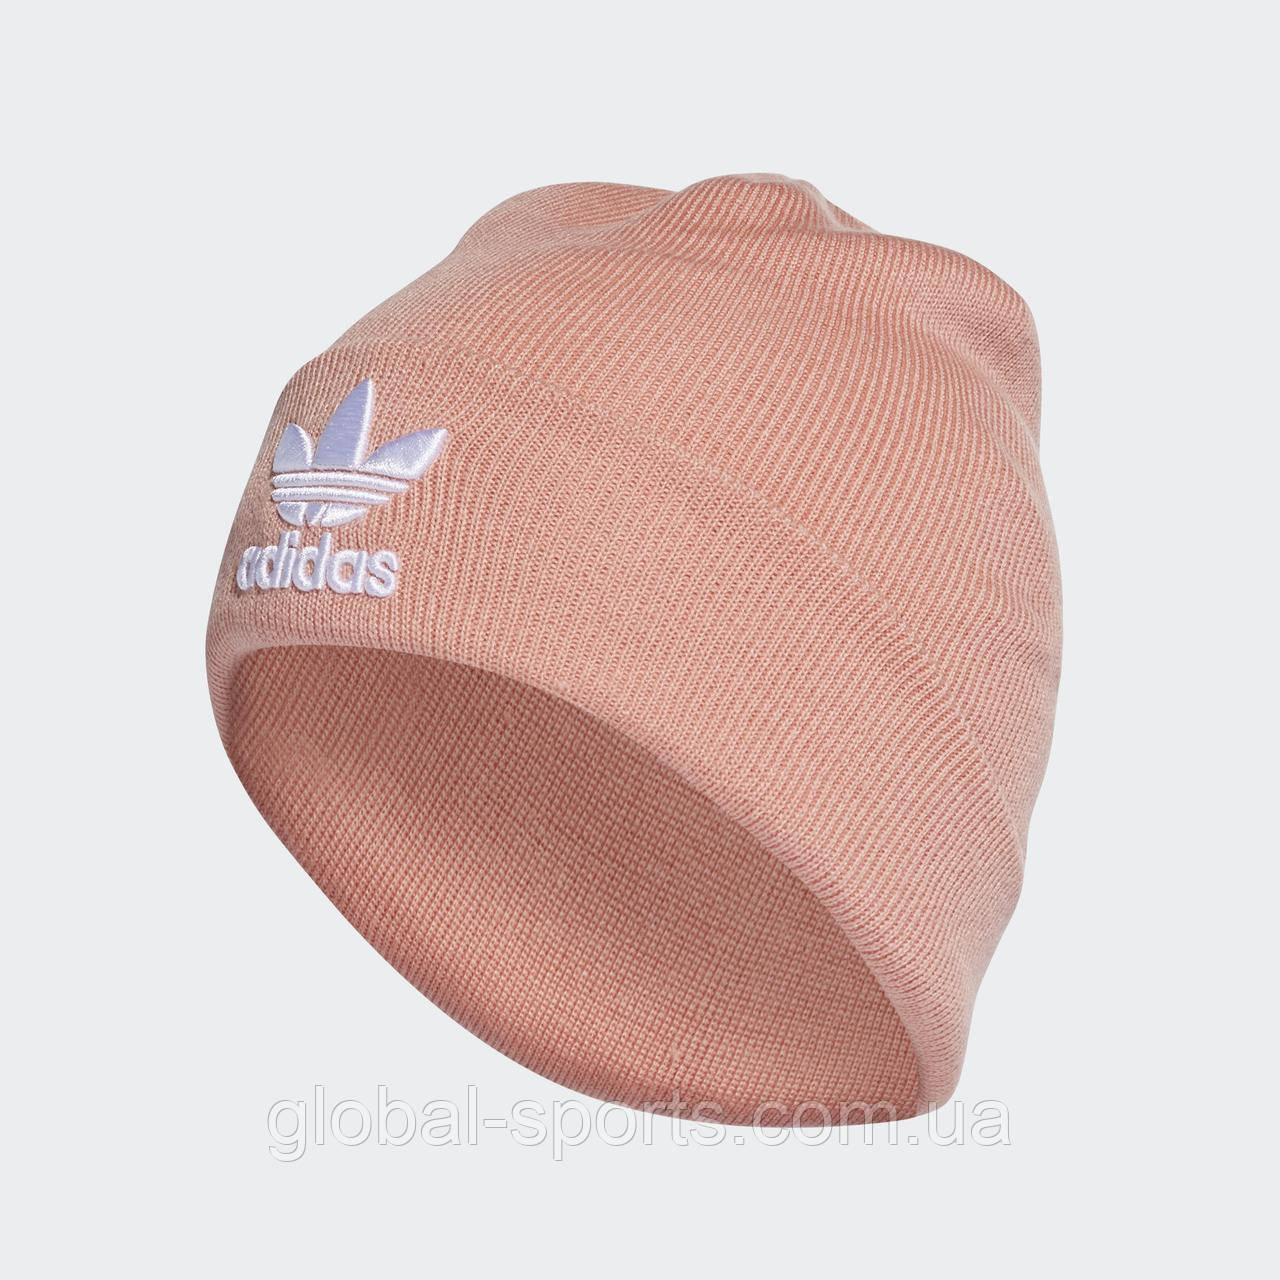 Жіноча шапка - біні Adidas Originals Trefoil (Артикул:DV2486)